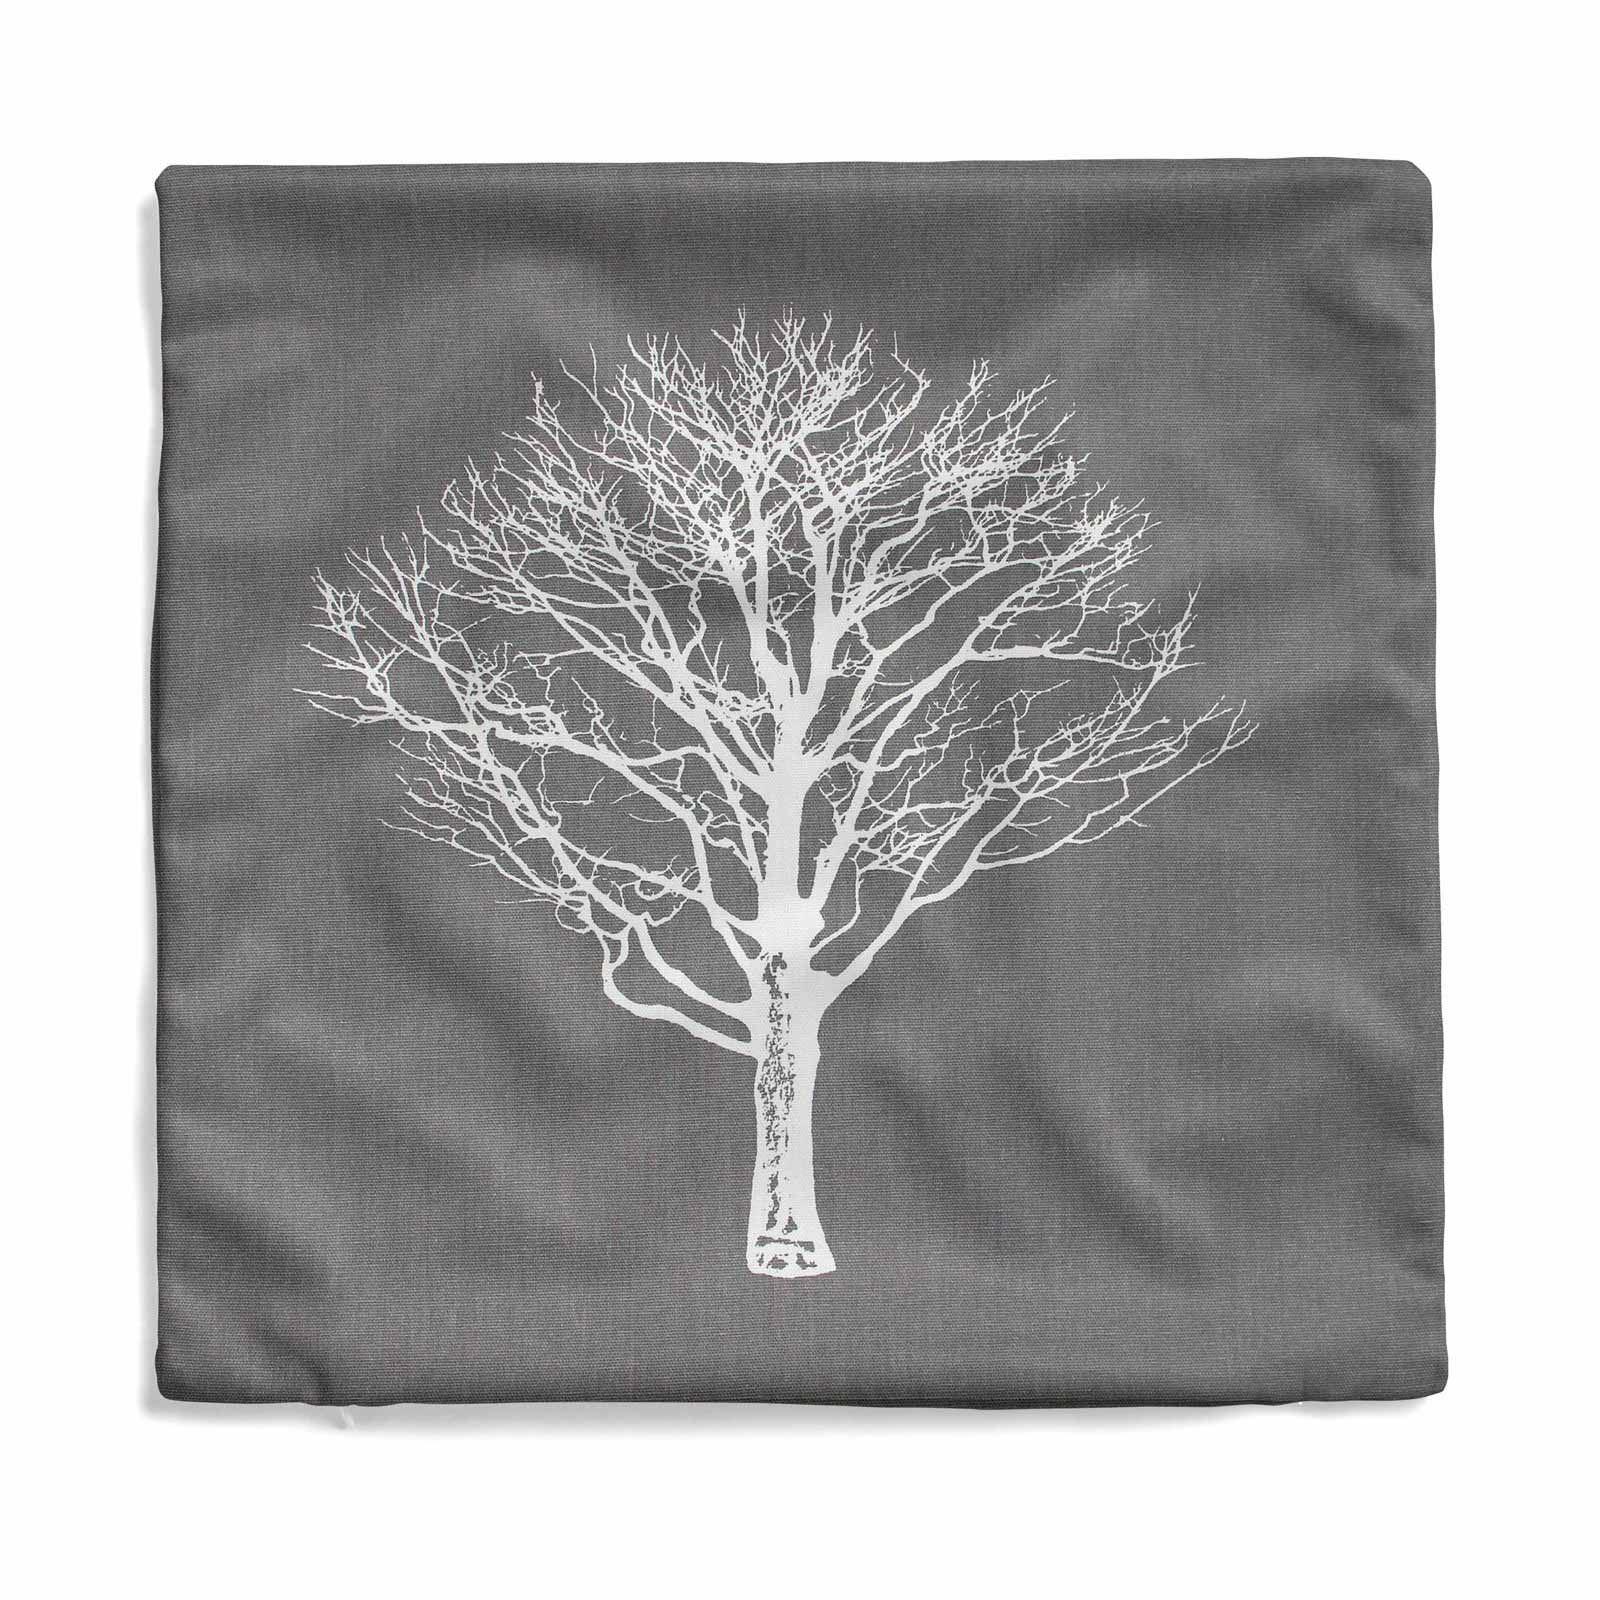 Woodland-Trees-Cushion-Cover-Modern-Reversible-Tree-Print-Covers-17-034-x-17-034 thumbnail 5